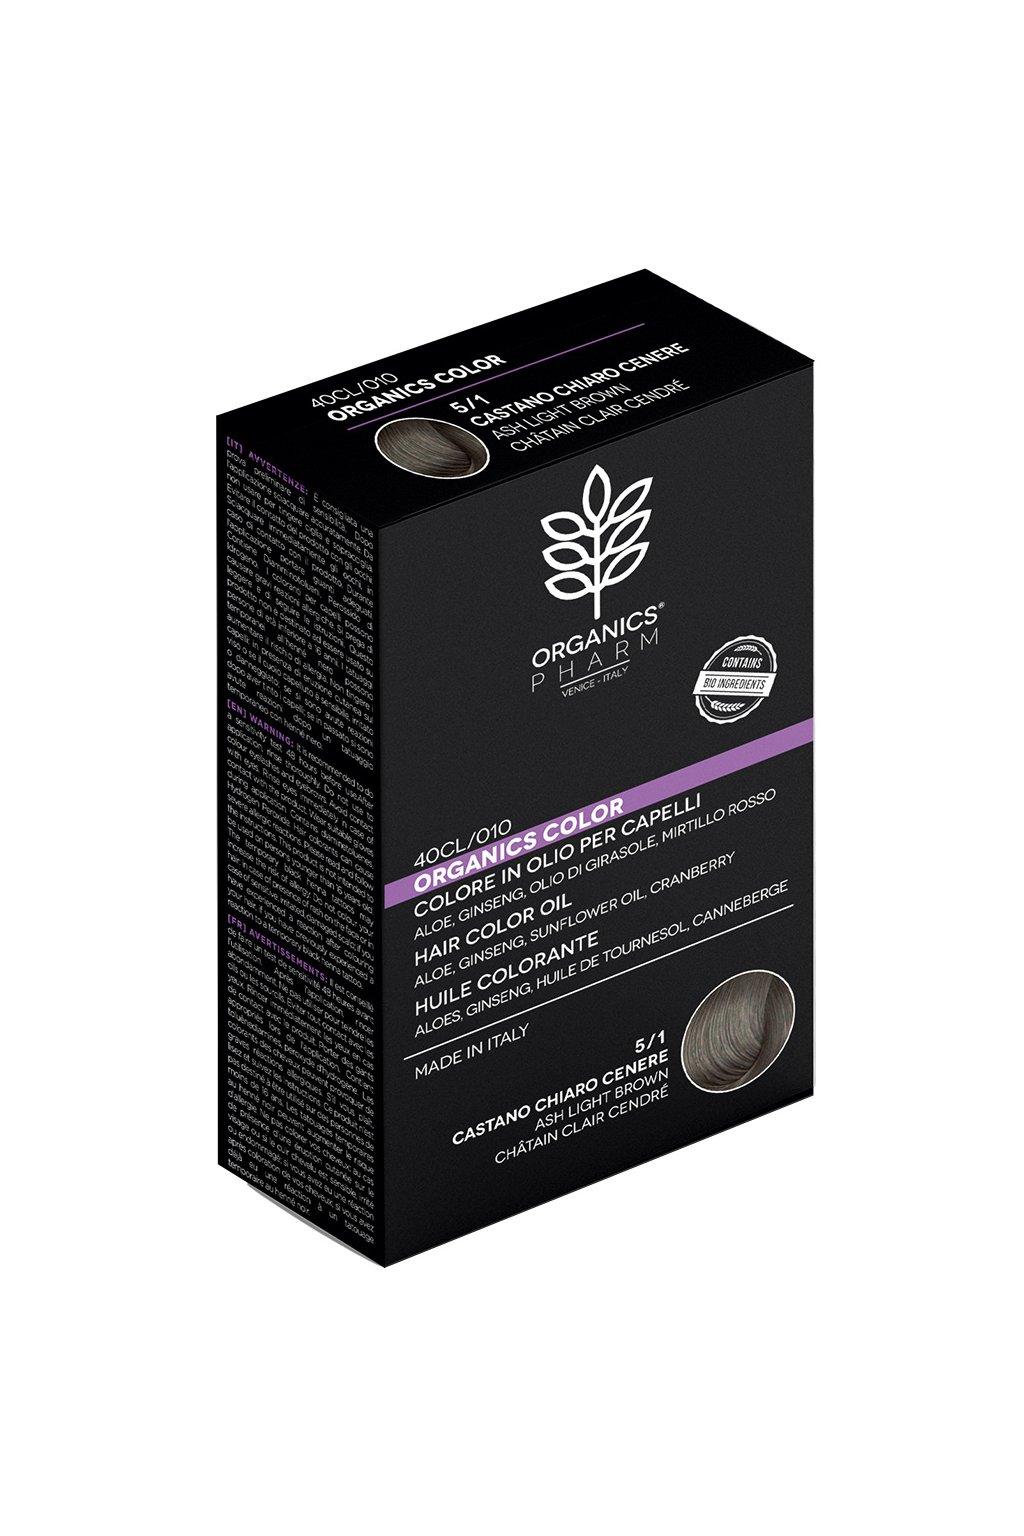 ORGANICS PHARM Organics Color Hair Color Oil 122ml 5 1 Ash Light Brown